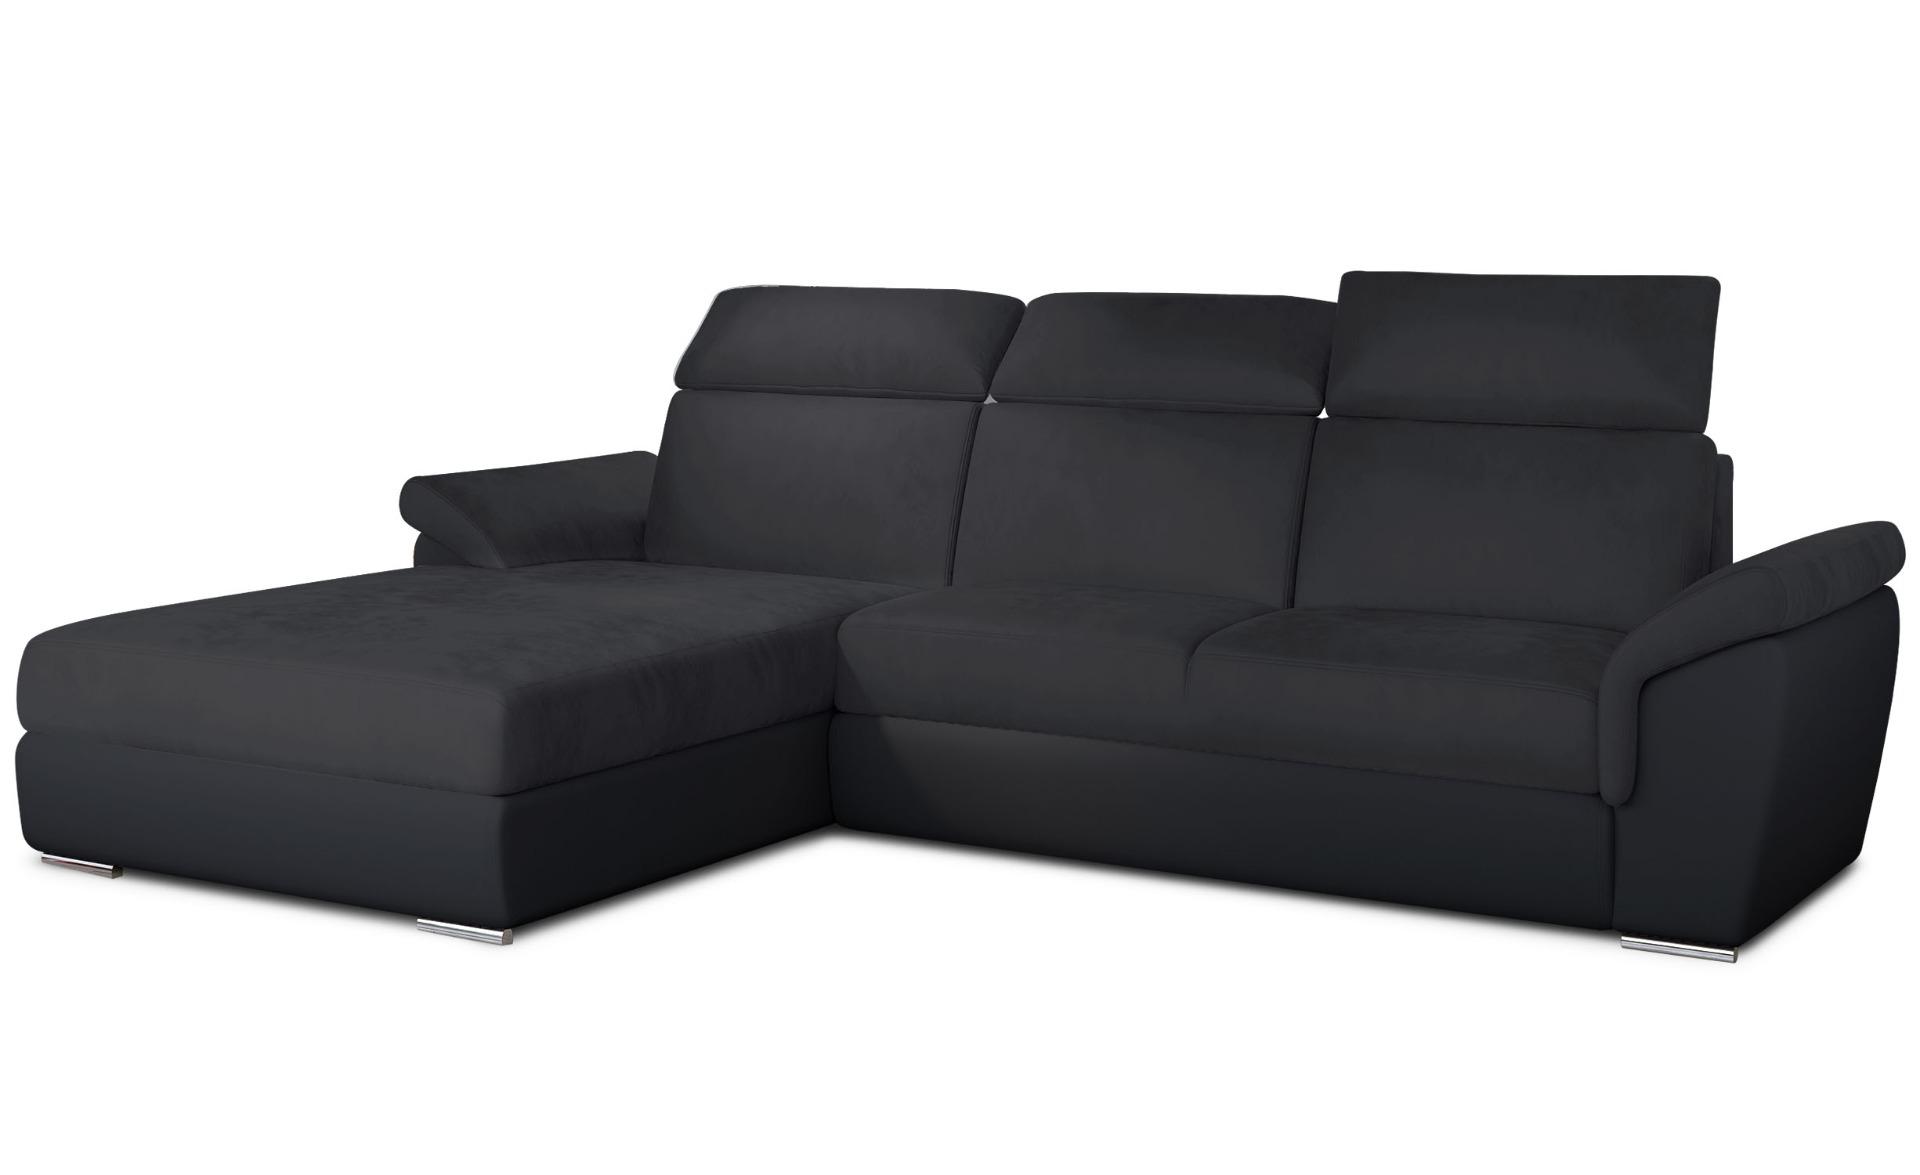 Canapé d'angle convertible Trevisco Simili Noir